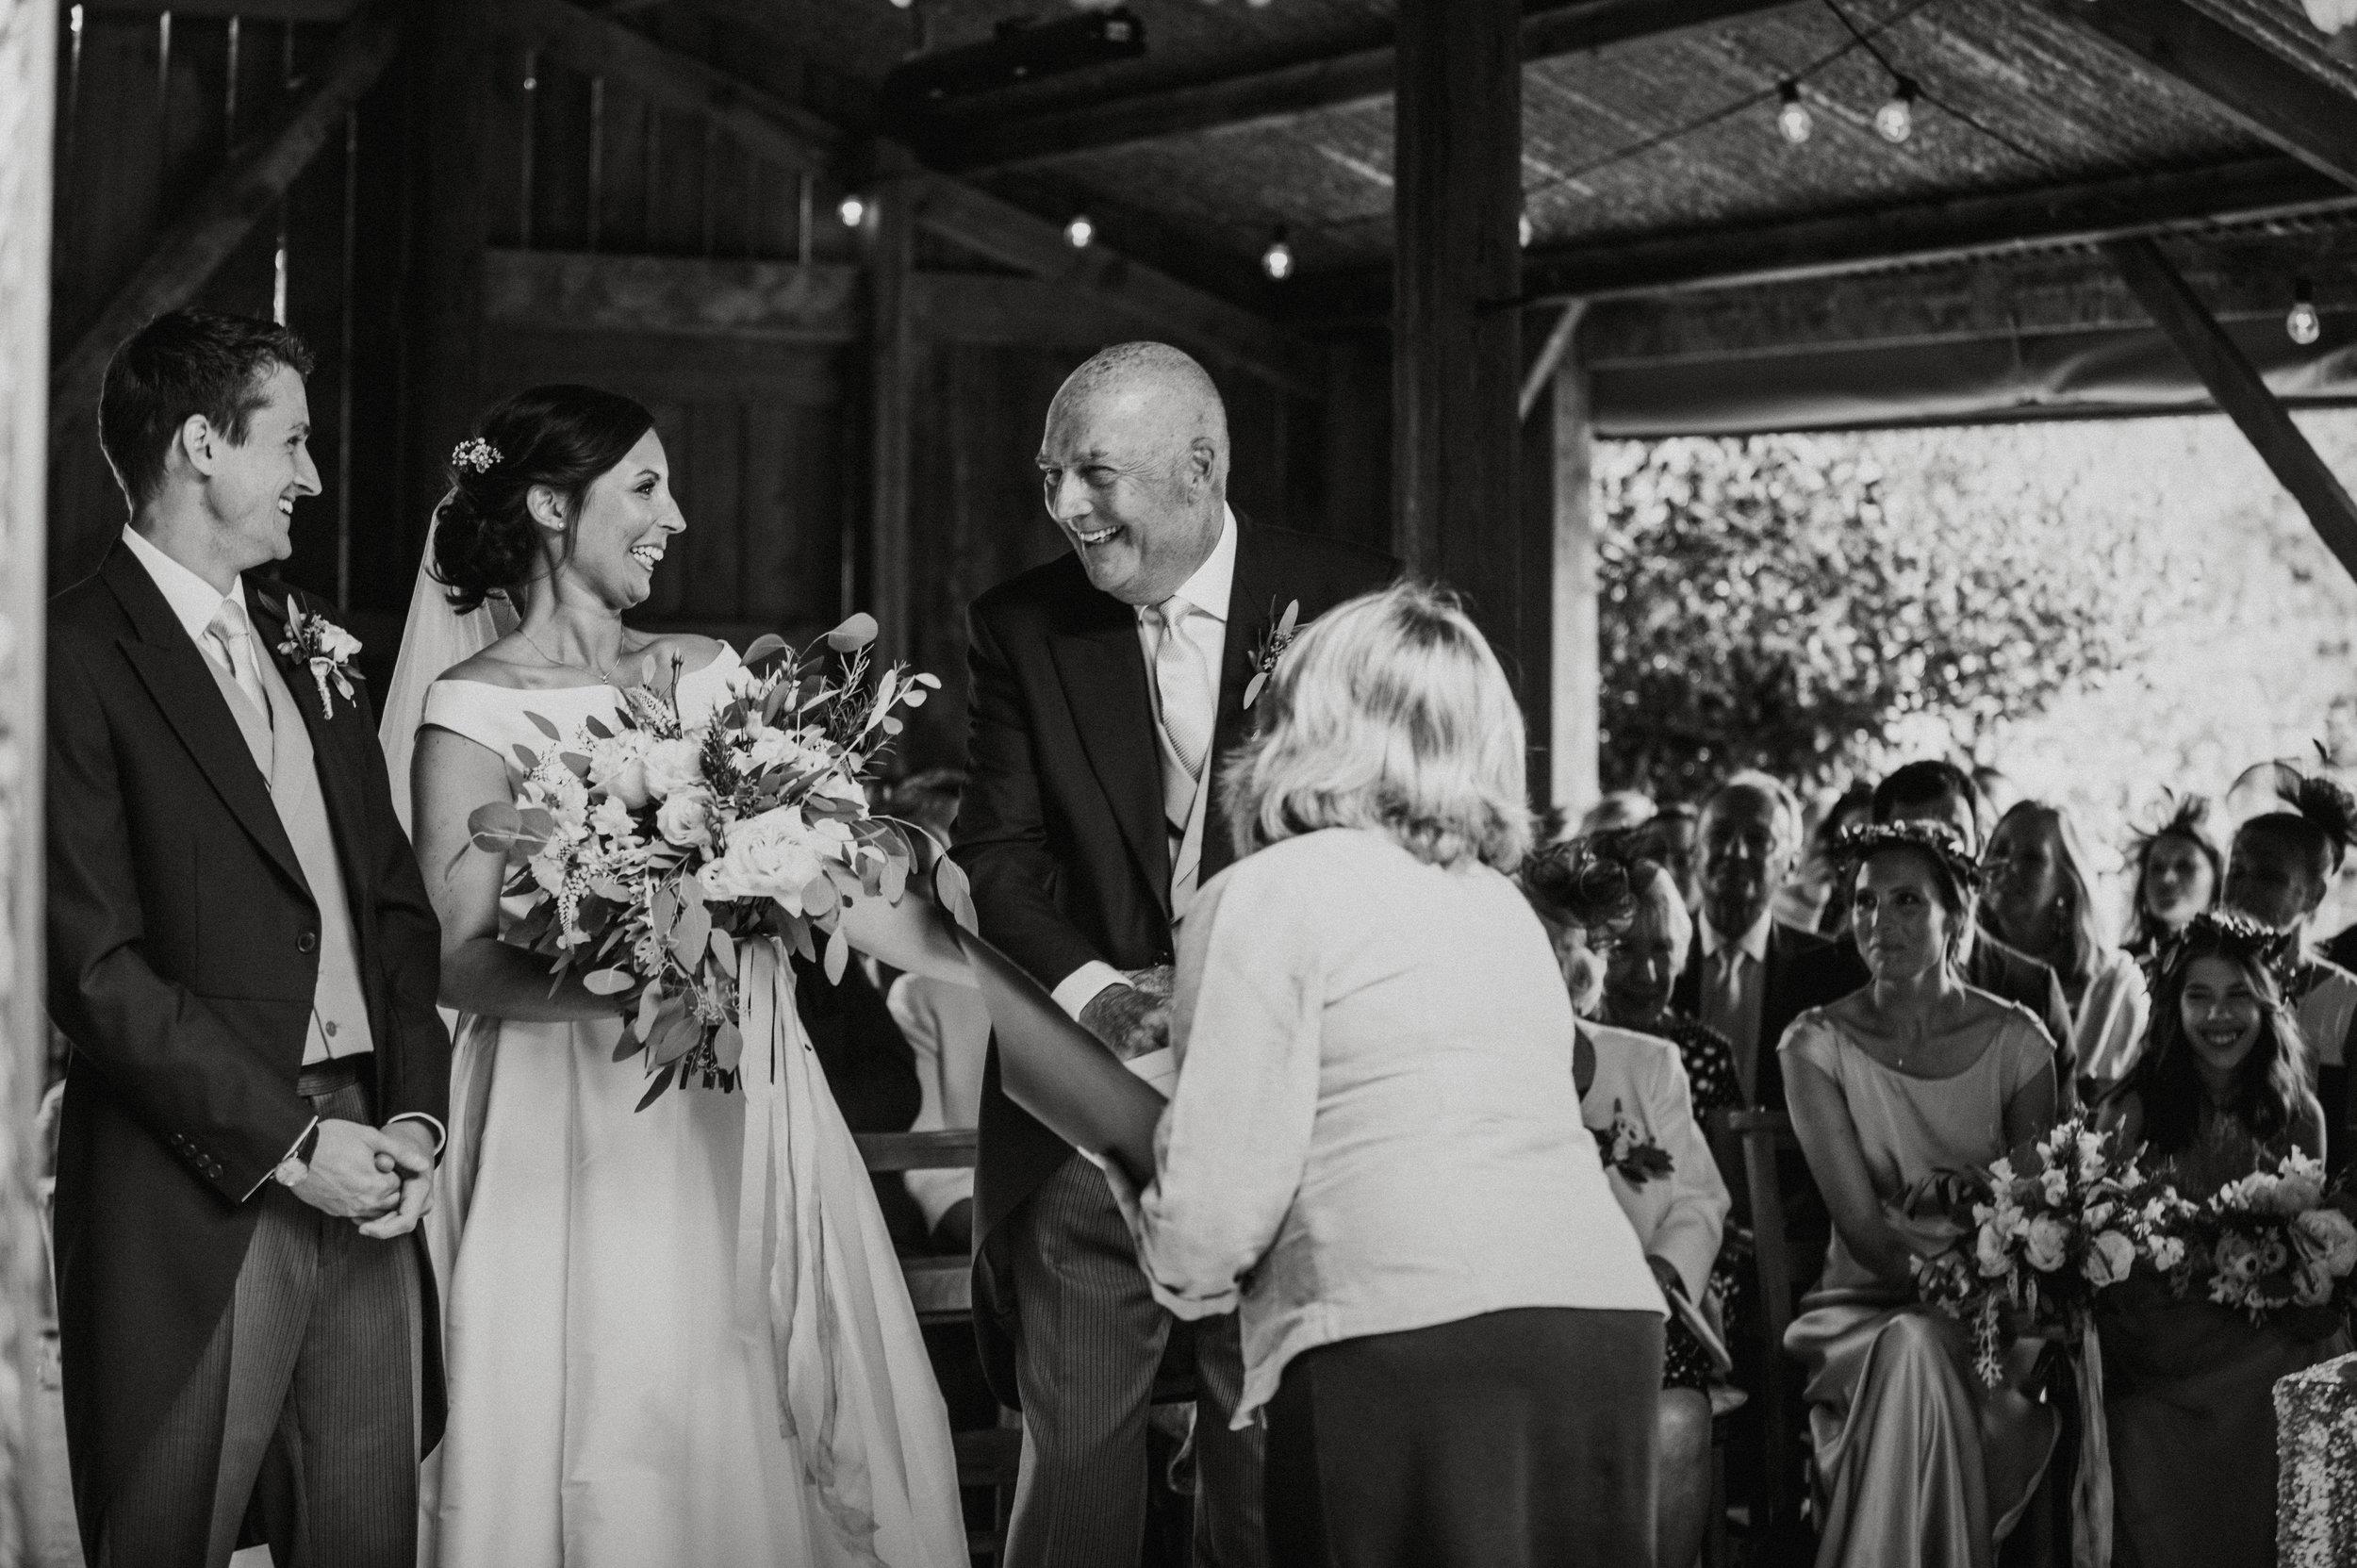 nancarrow-farm-wedding-photographer-cornwall-9.jpg